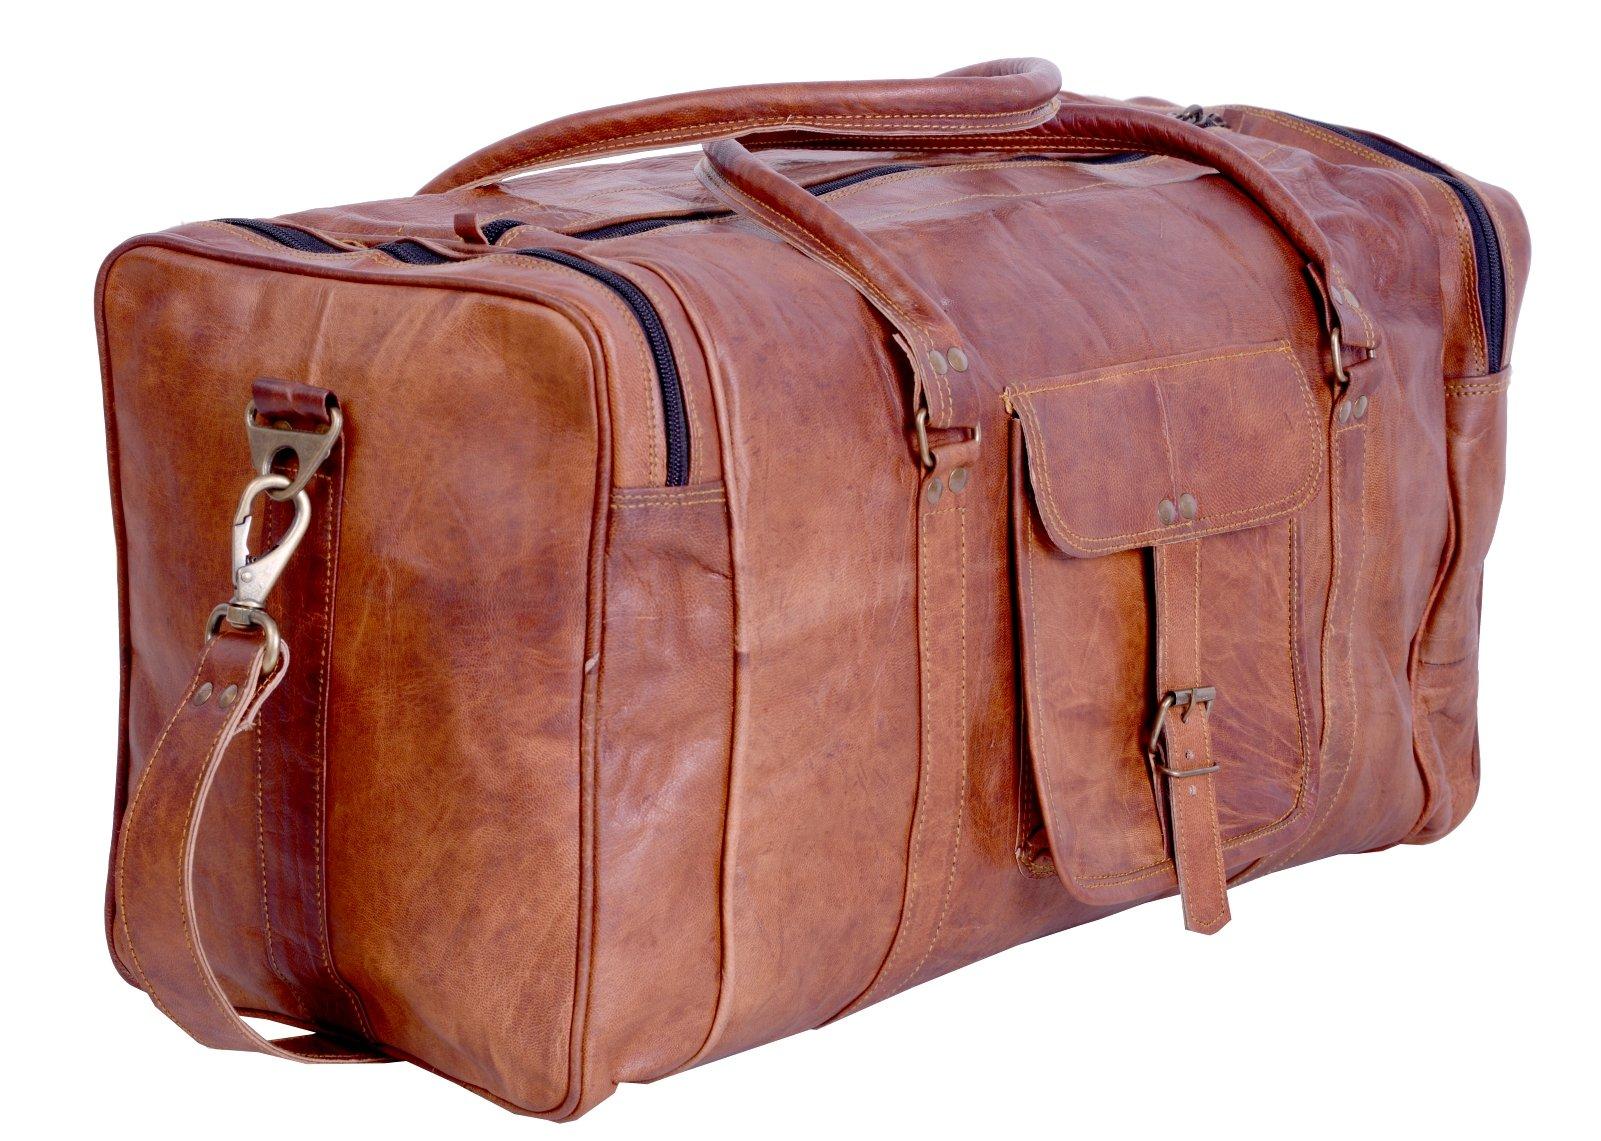 KPL 21 Inch Vintage Leather Duffel Travel Gym Sports Overnight Weekend Duffel Bag